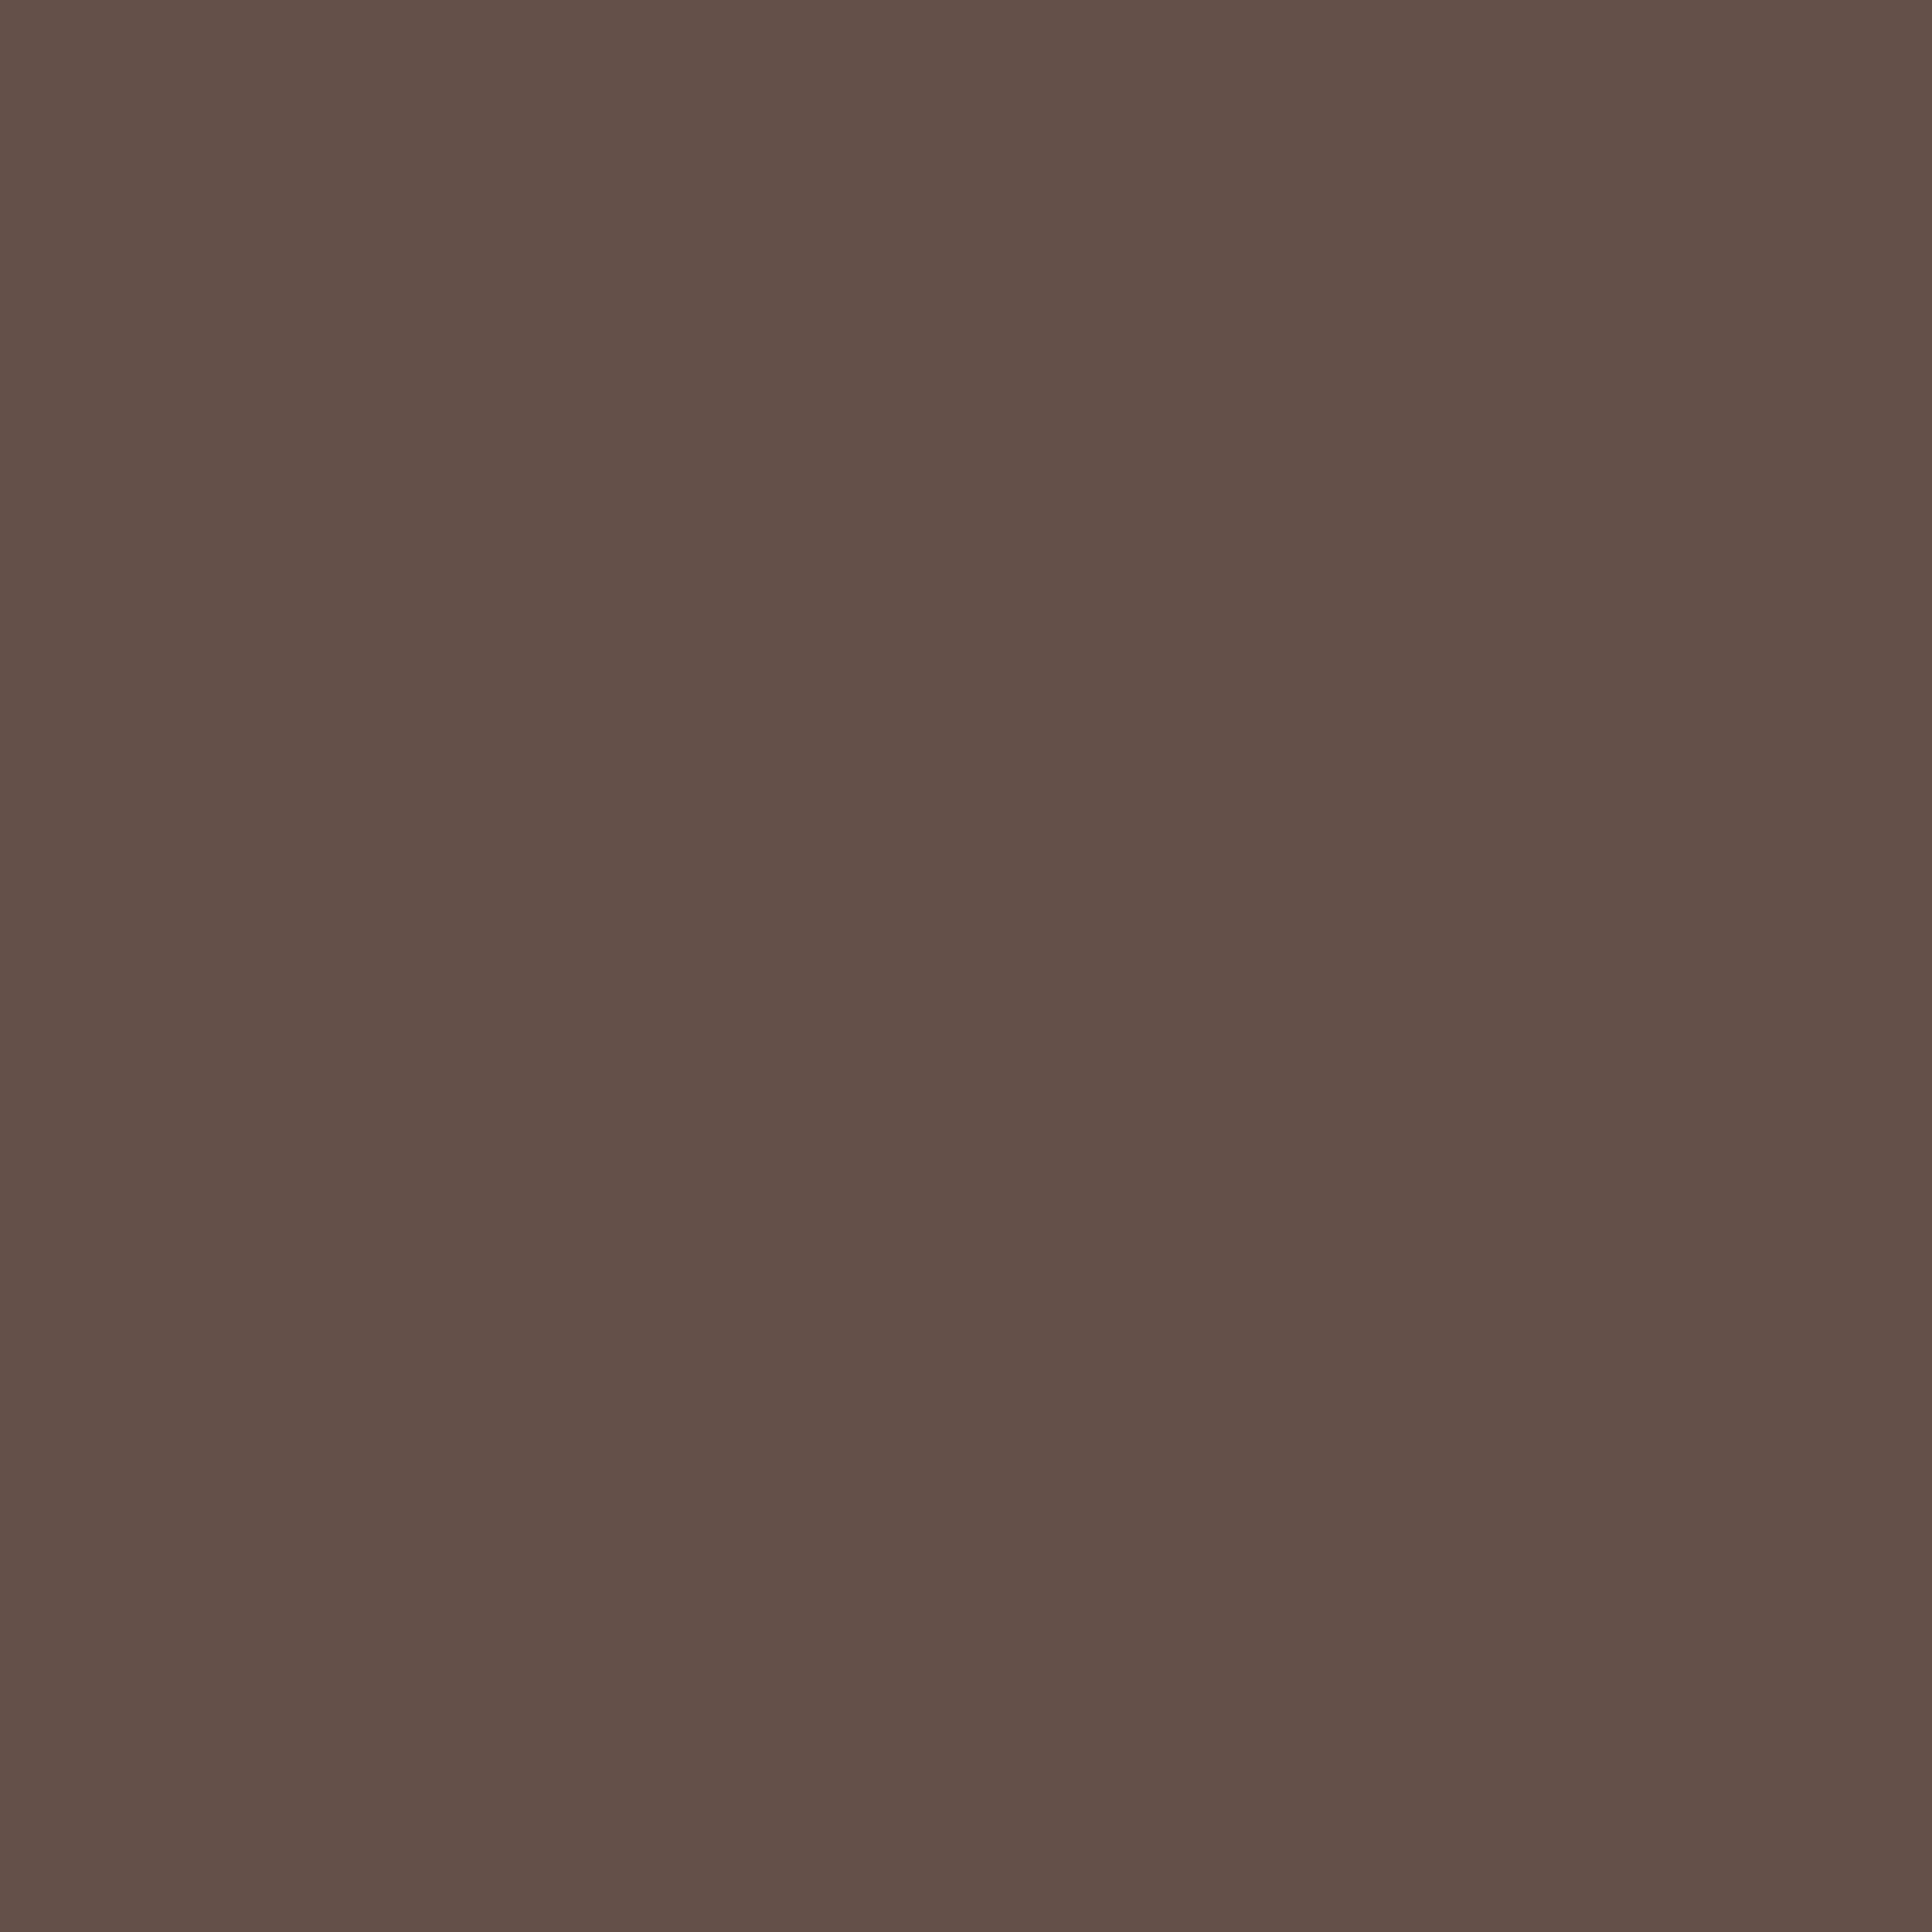 2732x2732 Umber Solid Color Background